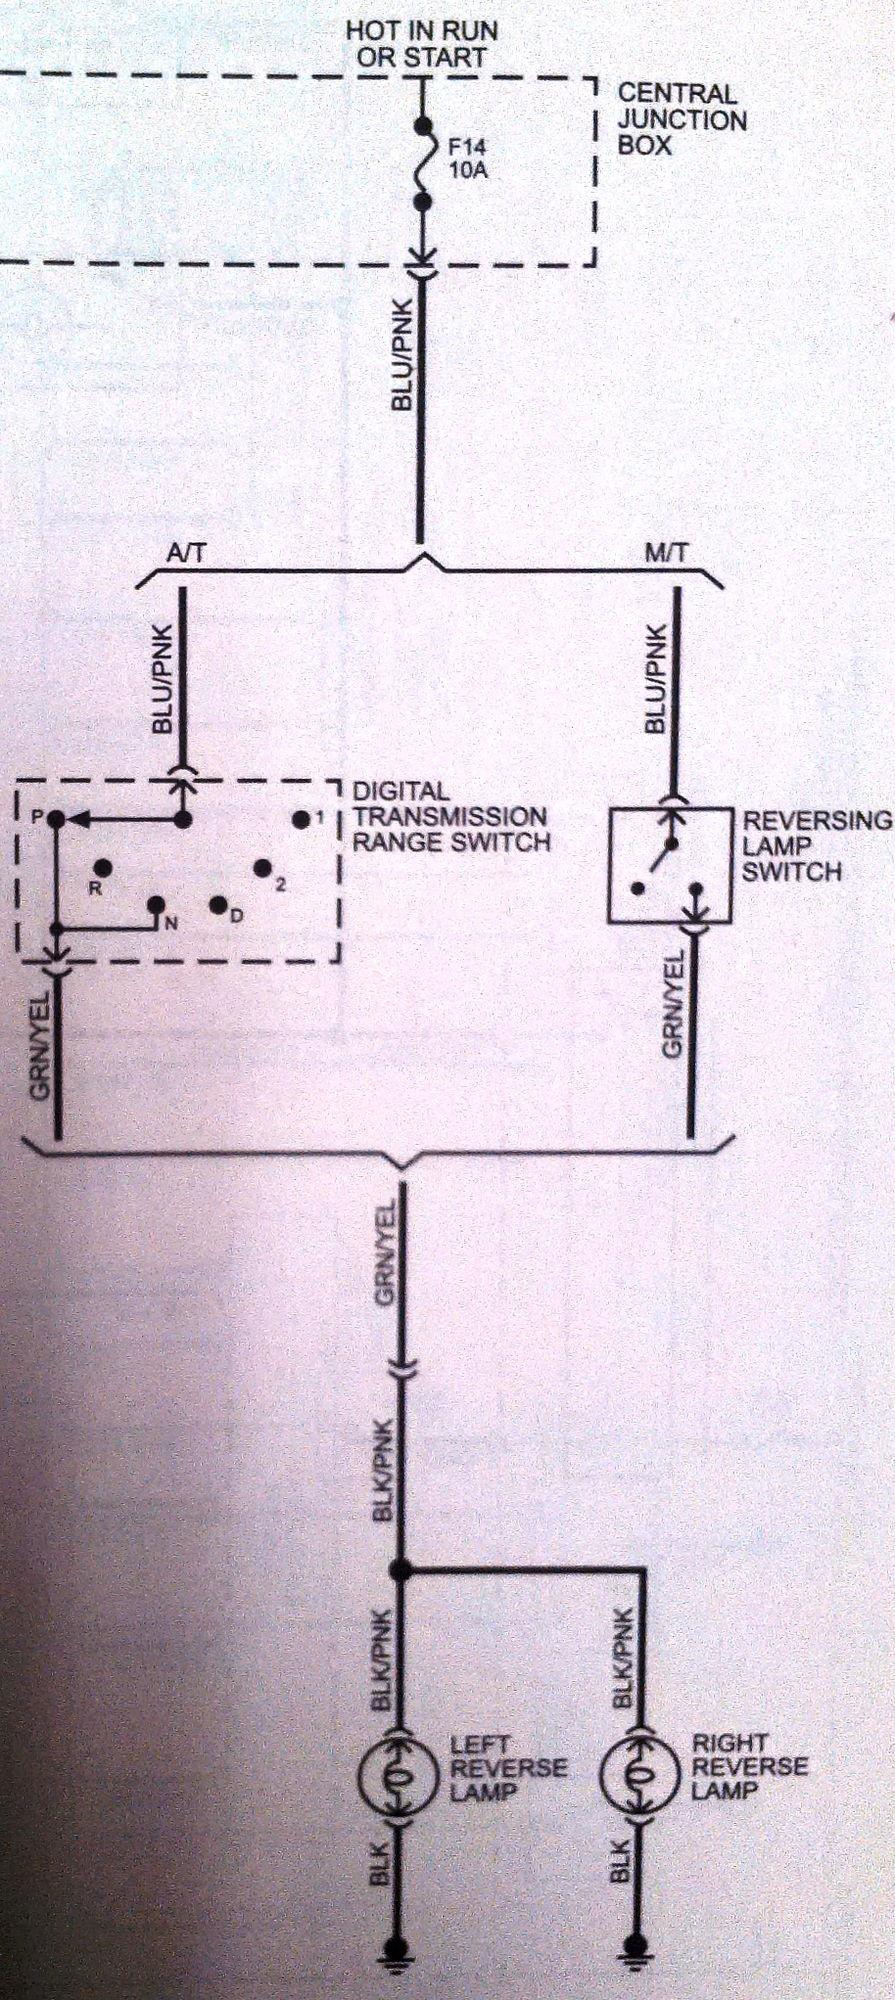 From haynes manual